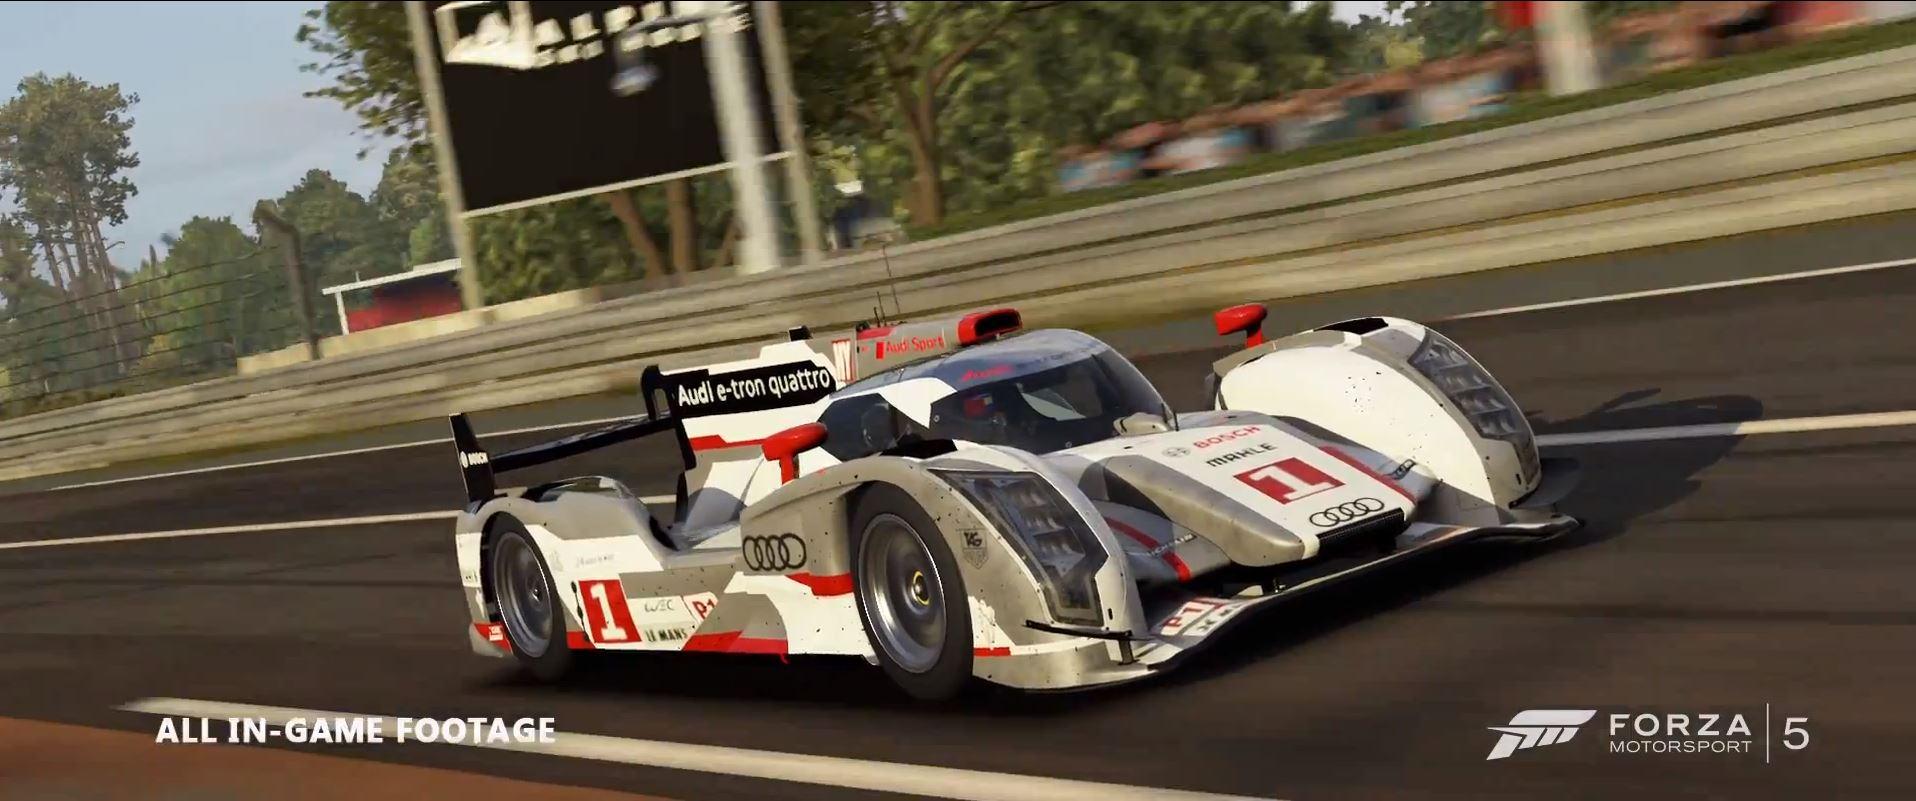 Forza Motorsport 5 - x Audi - Trailer - Inside Sim Racing